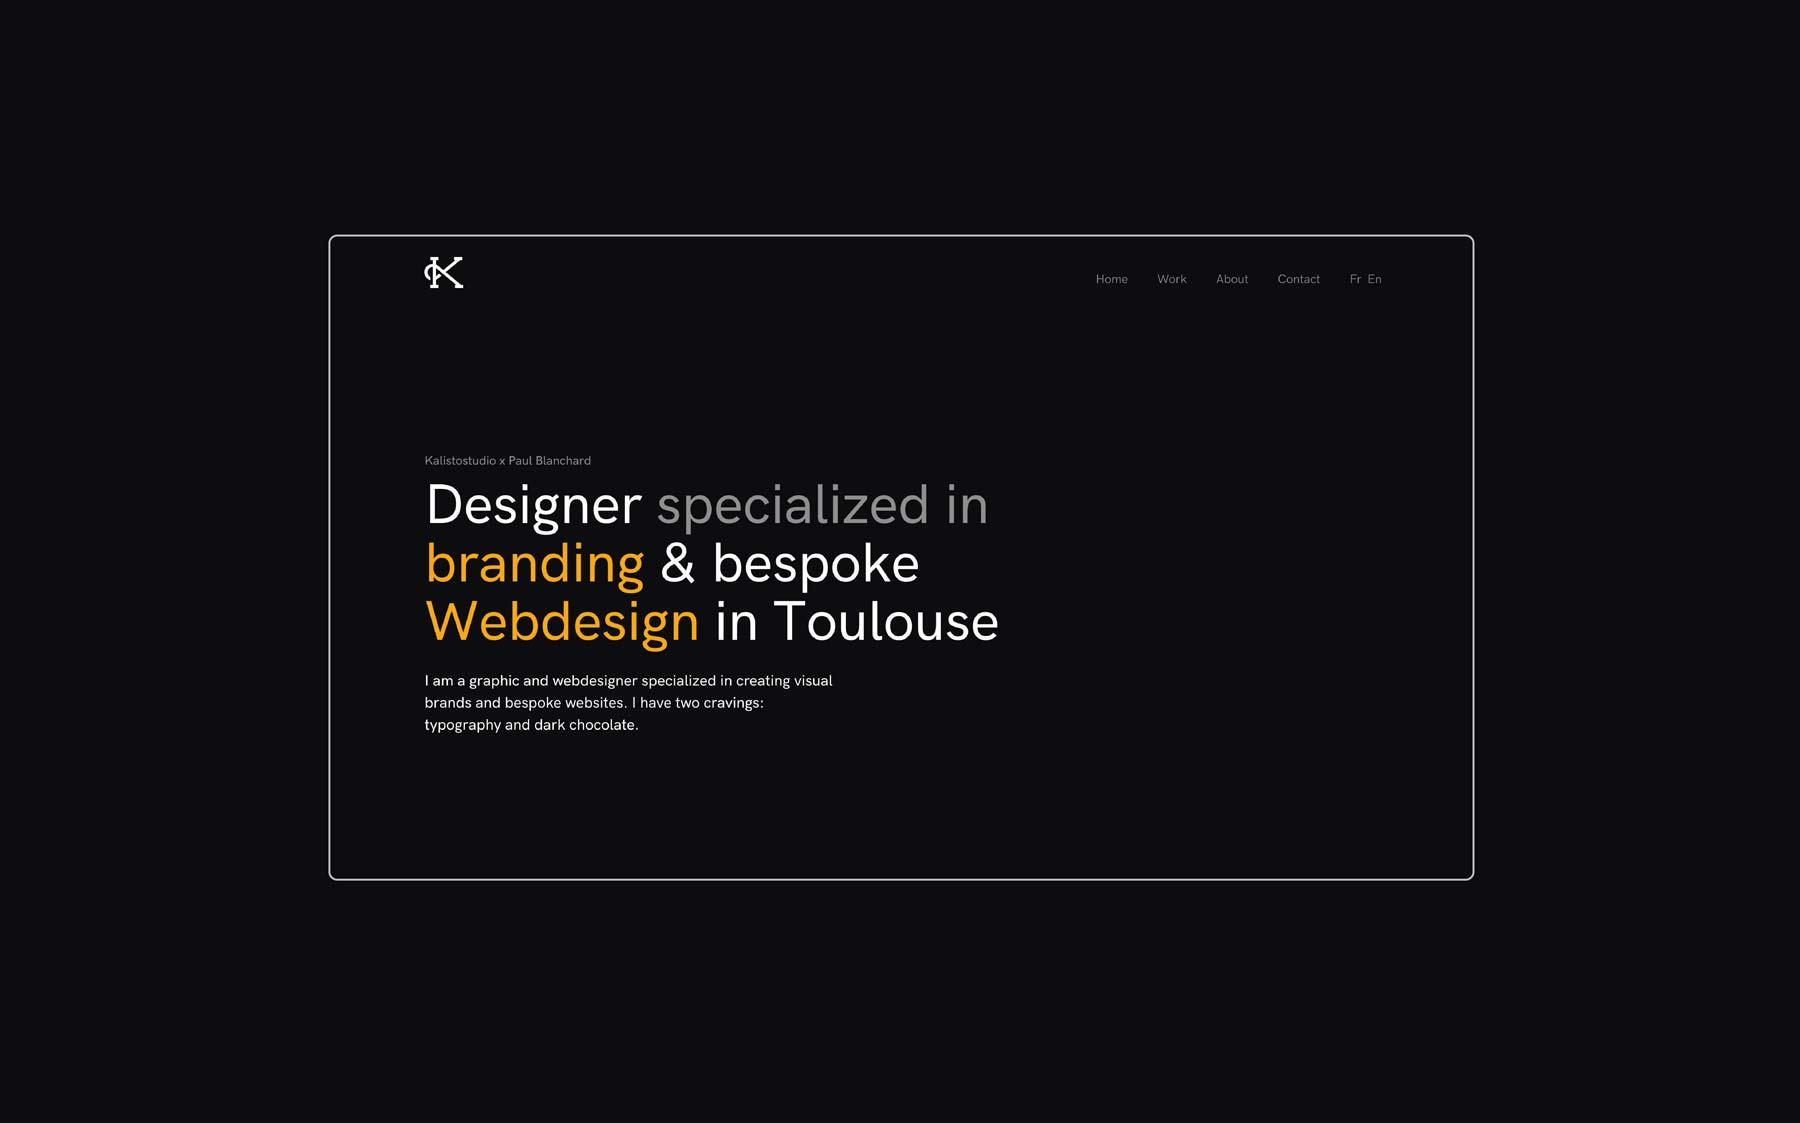 Kalistostudio ipad mockup website webdesign